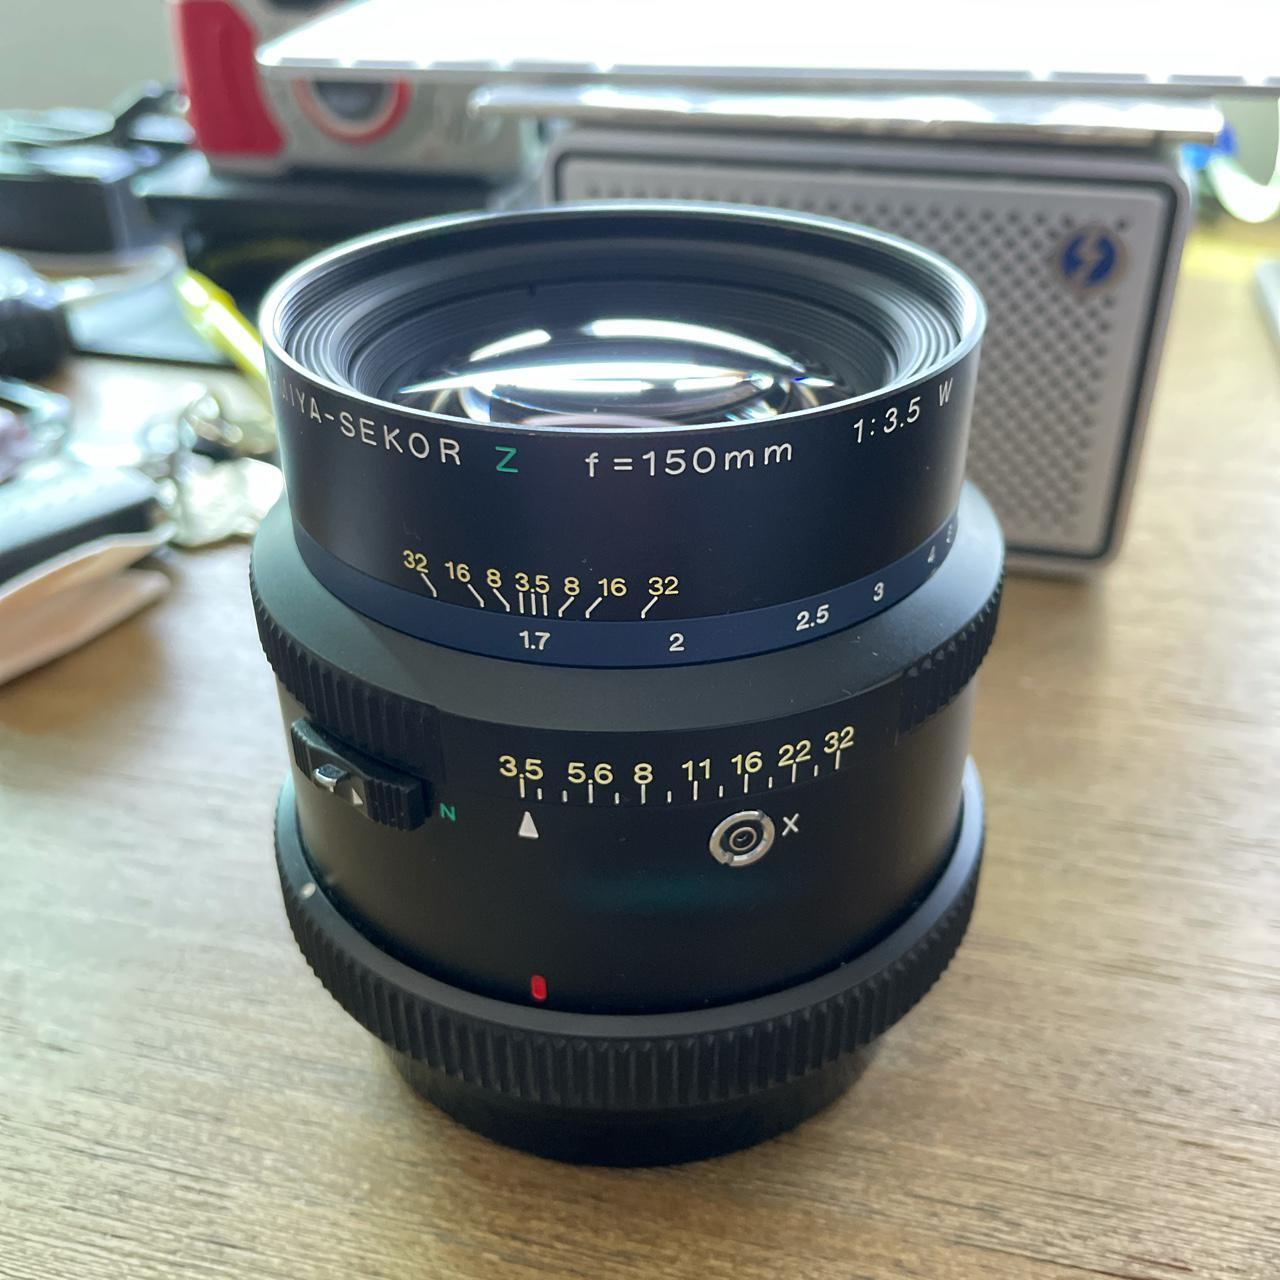 Product Image 1 - Mamiya RZ67 Sekor Z 150mm